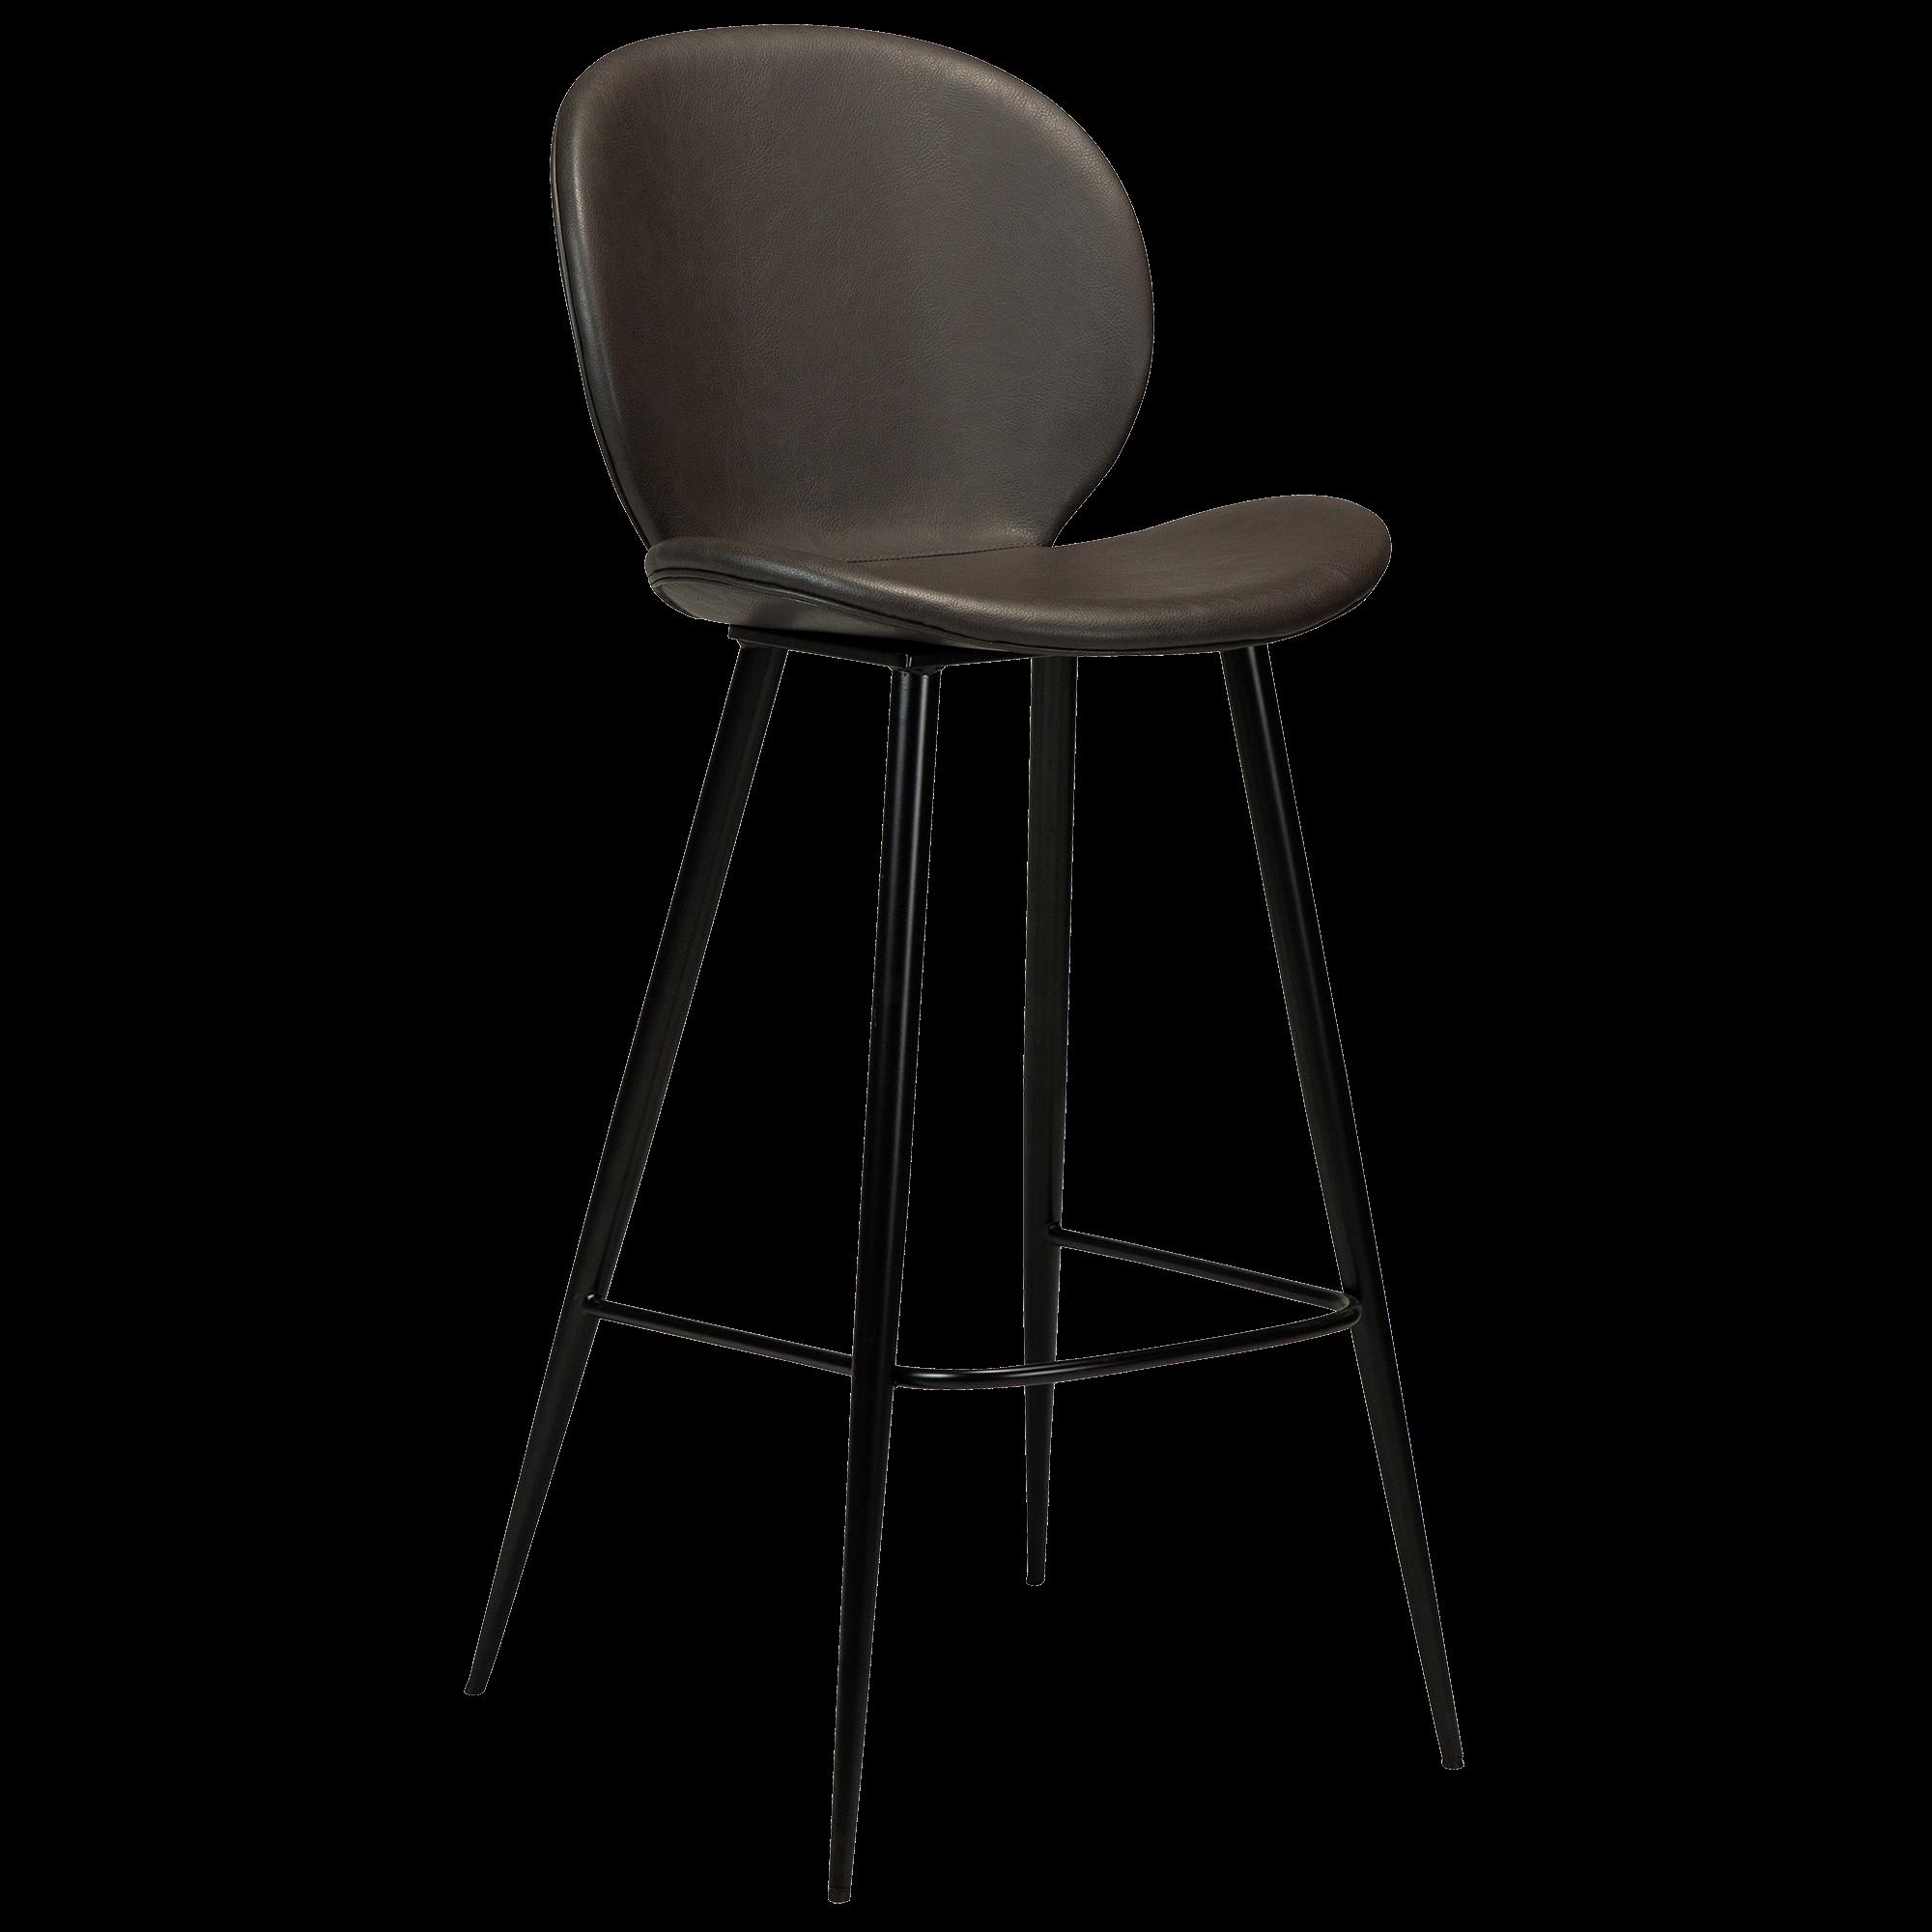 CLOUD Bar Stool Black Conical Metal Legs